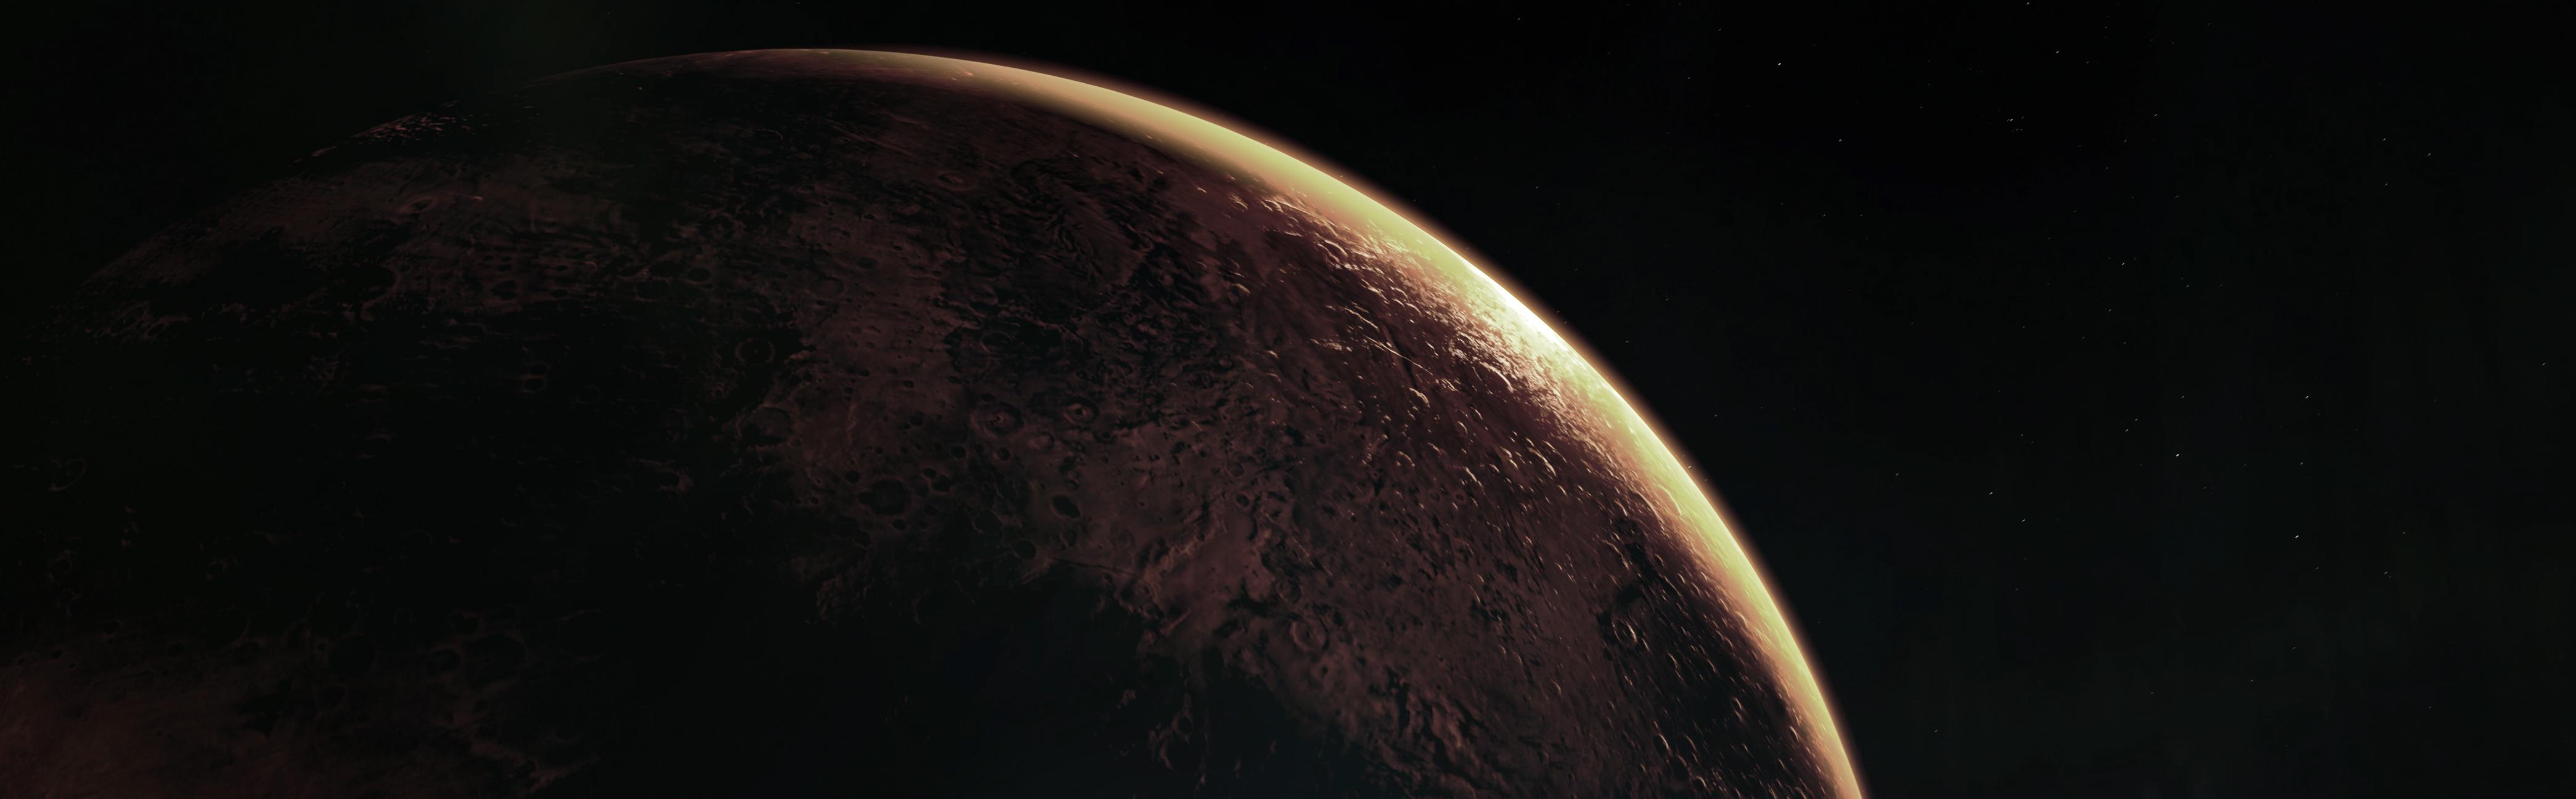 NASA's Planet-Hunting TESS Telescope Finds 21 New Worlds in ... on zeta reticuli alien script, zeta to the left of star planet, zeta reticuli planet hubble, zeta reticuli alien hybrid,